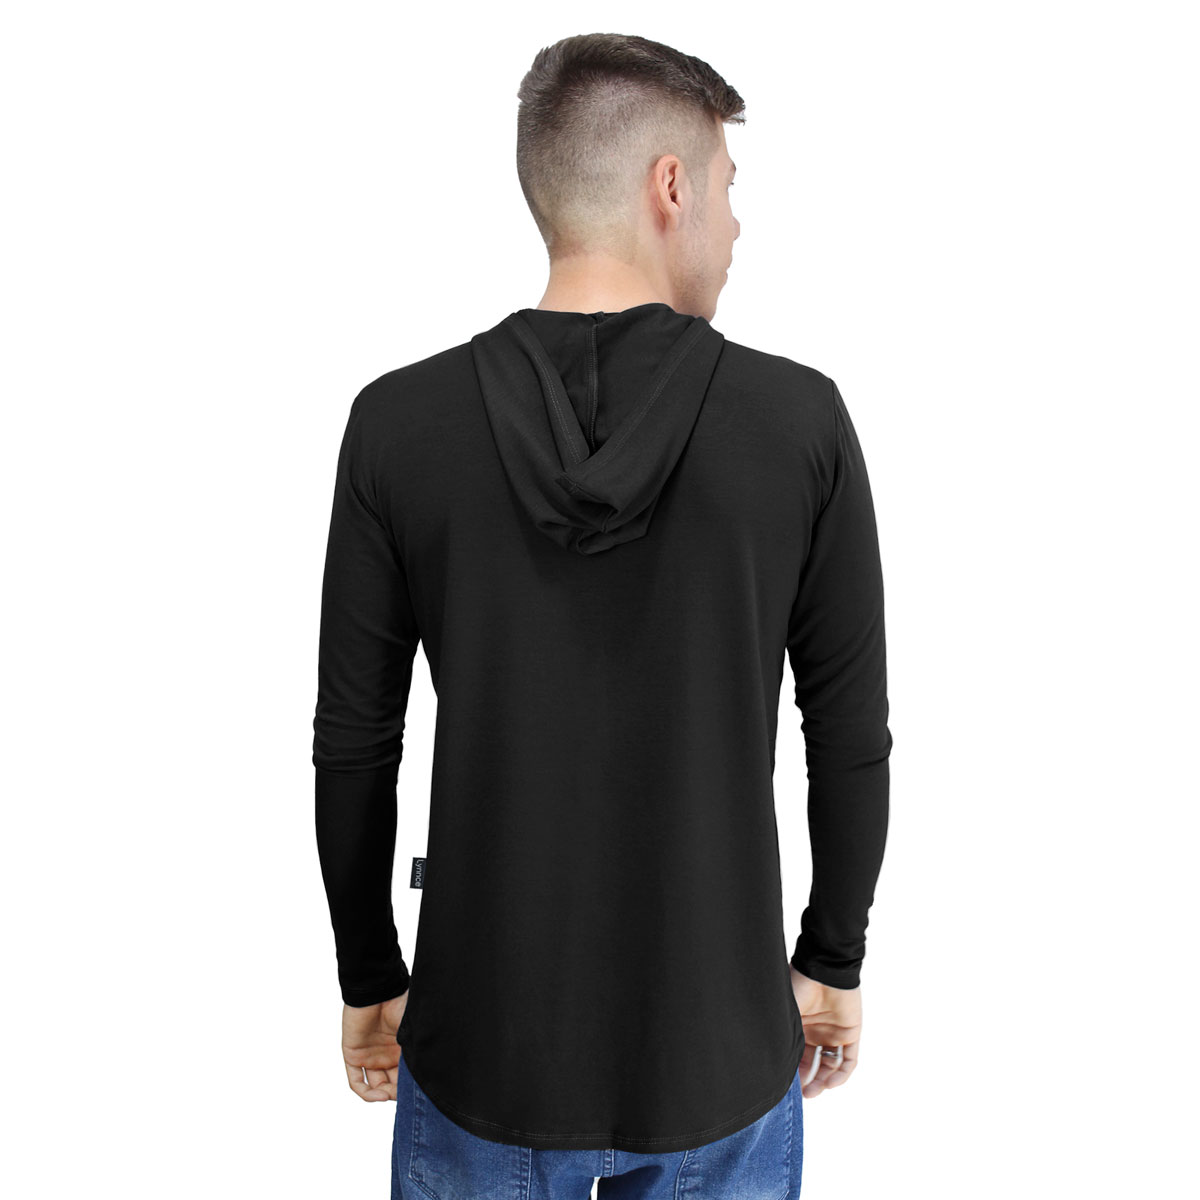 Camiseta Masculina Com Capuz Manga Longa Lynnce